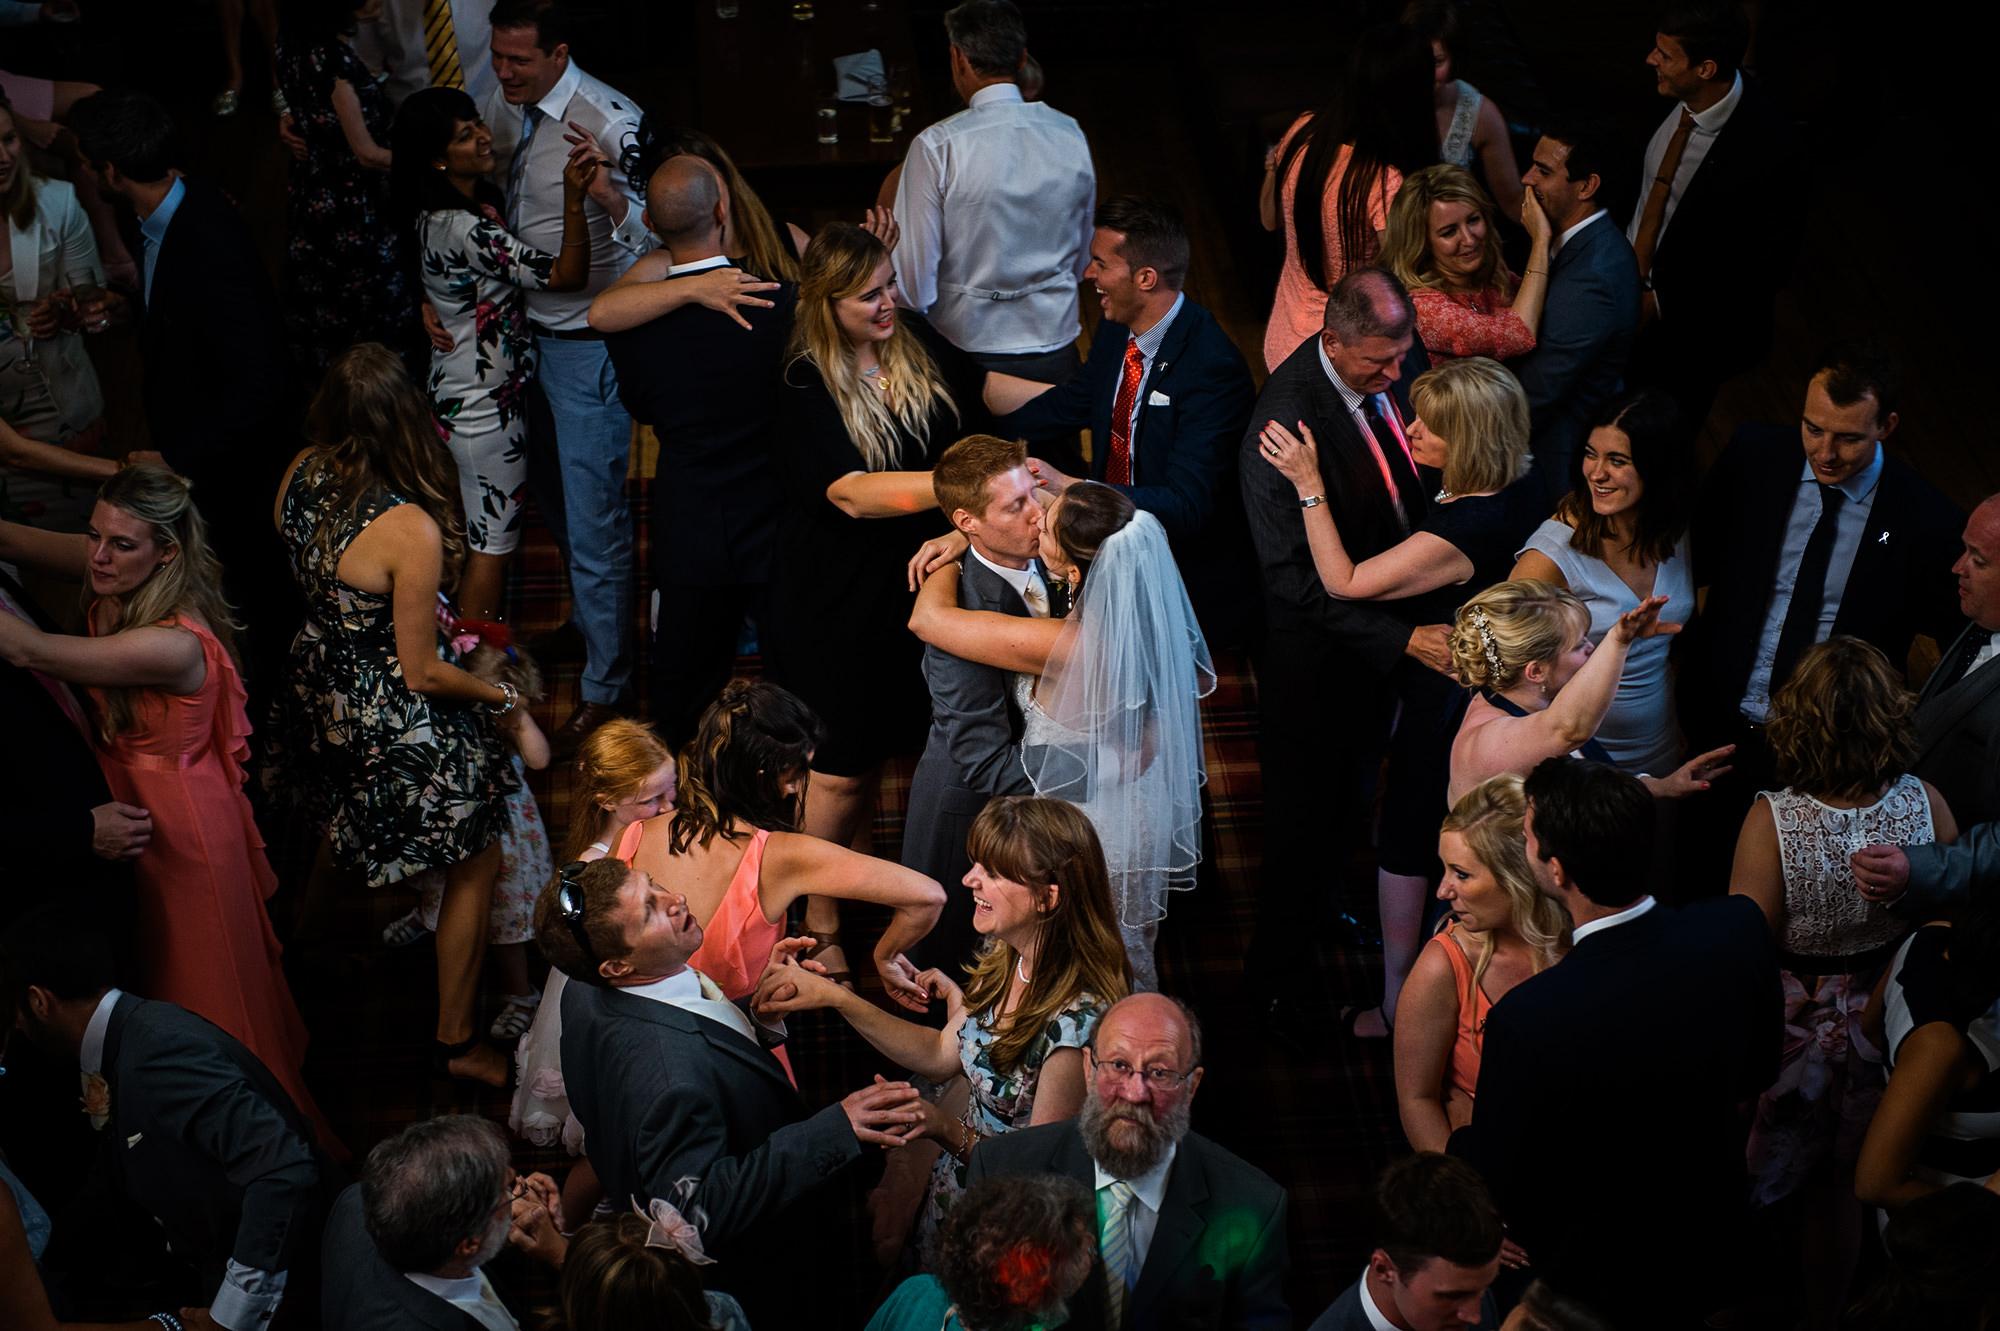 Simon biffen-best of 2015 wedding photographs-42